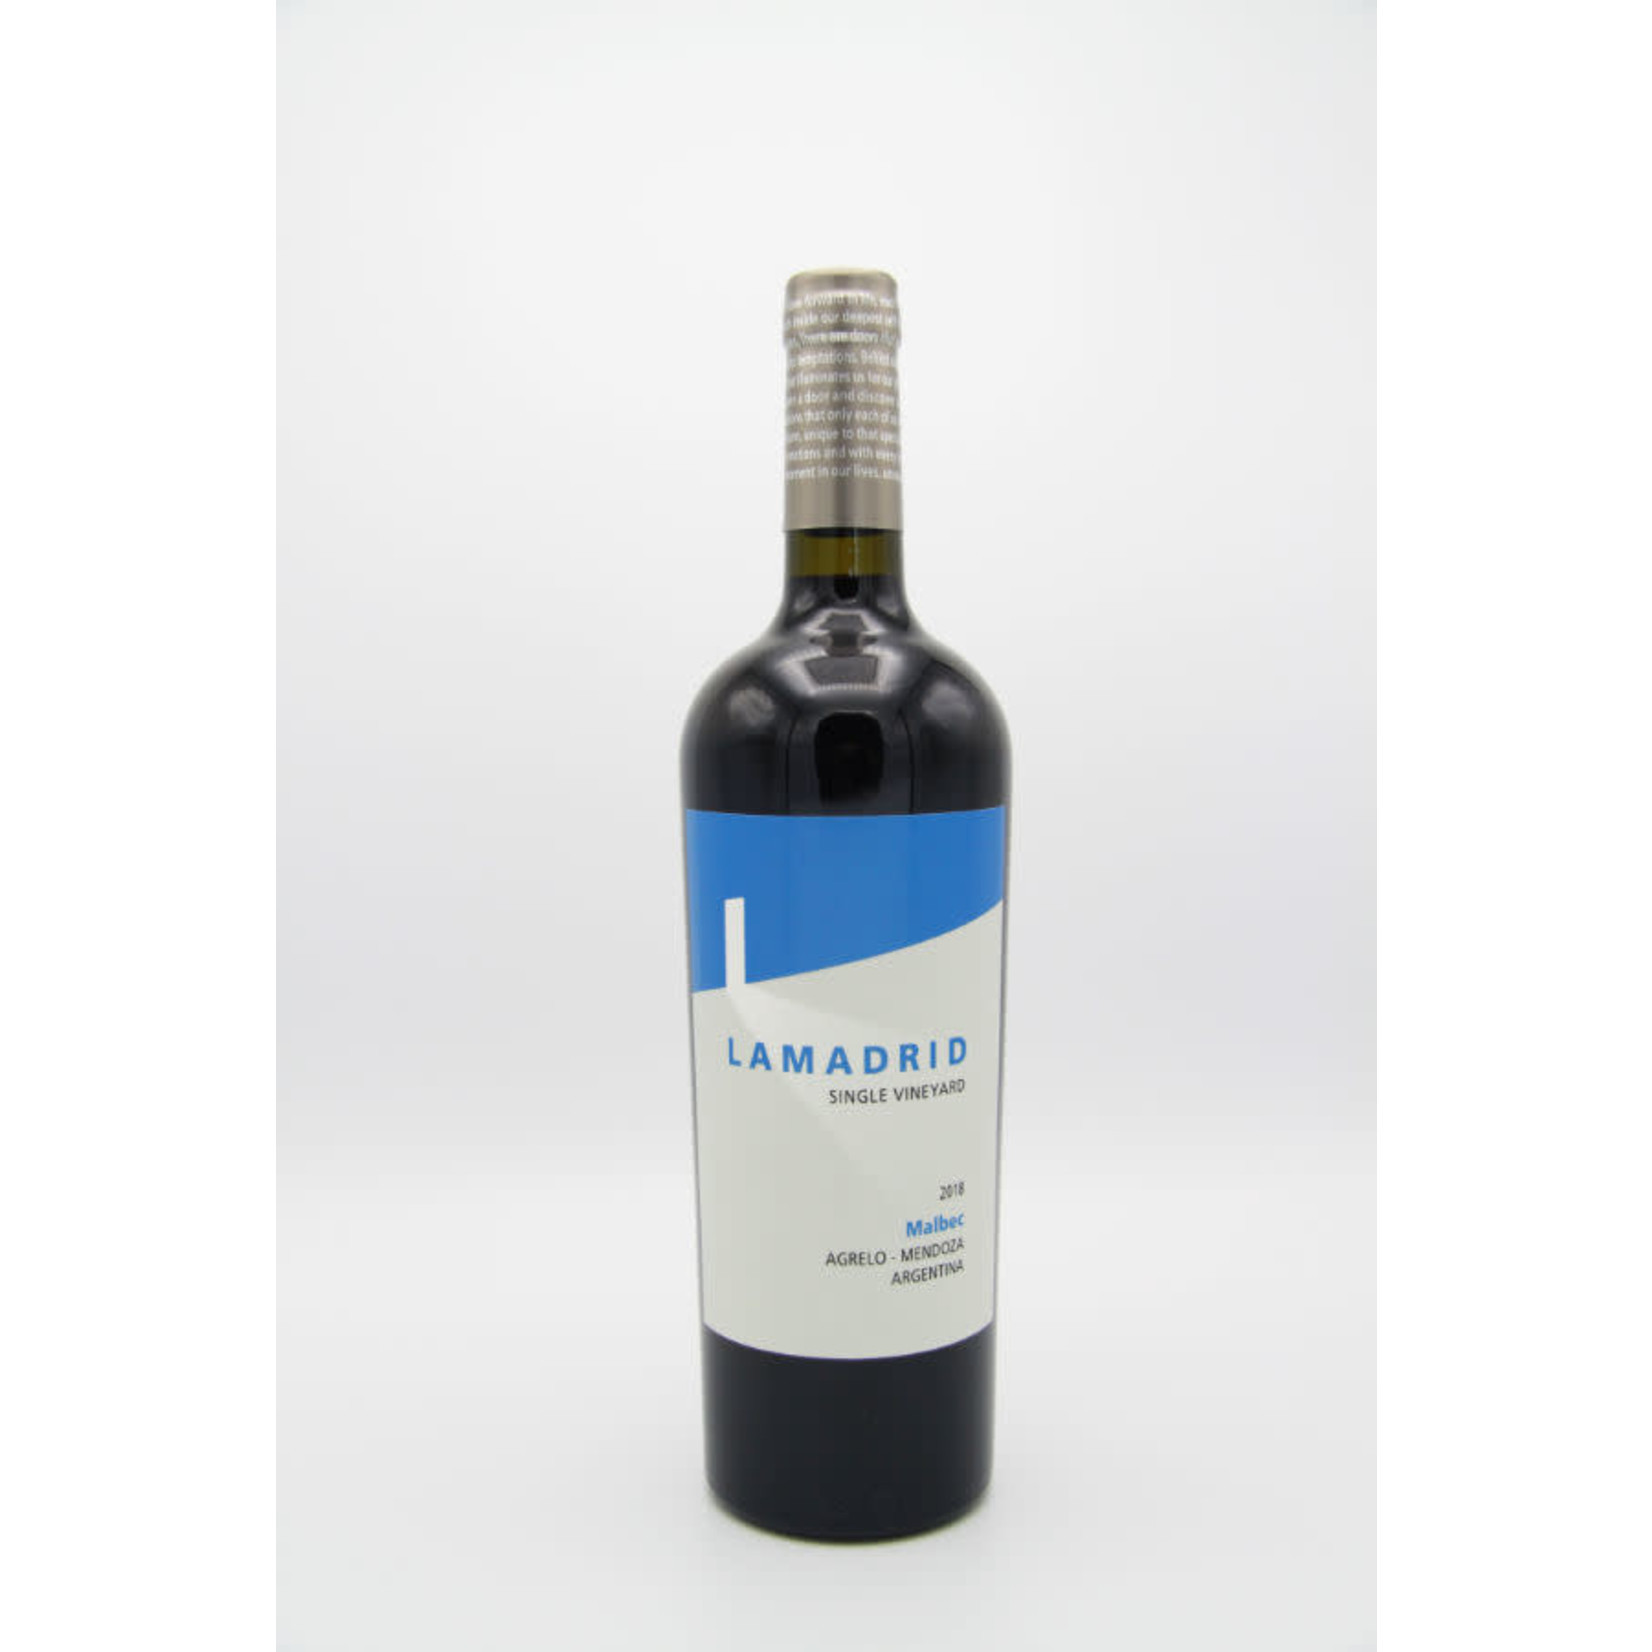 2018 Lamadrid 'Single Vineyard' Malbec